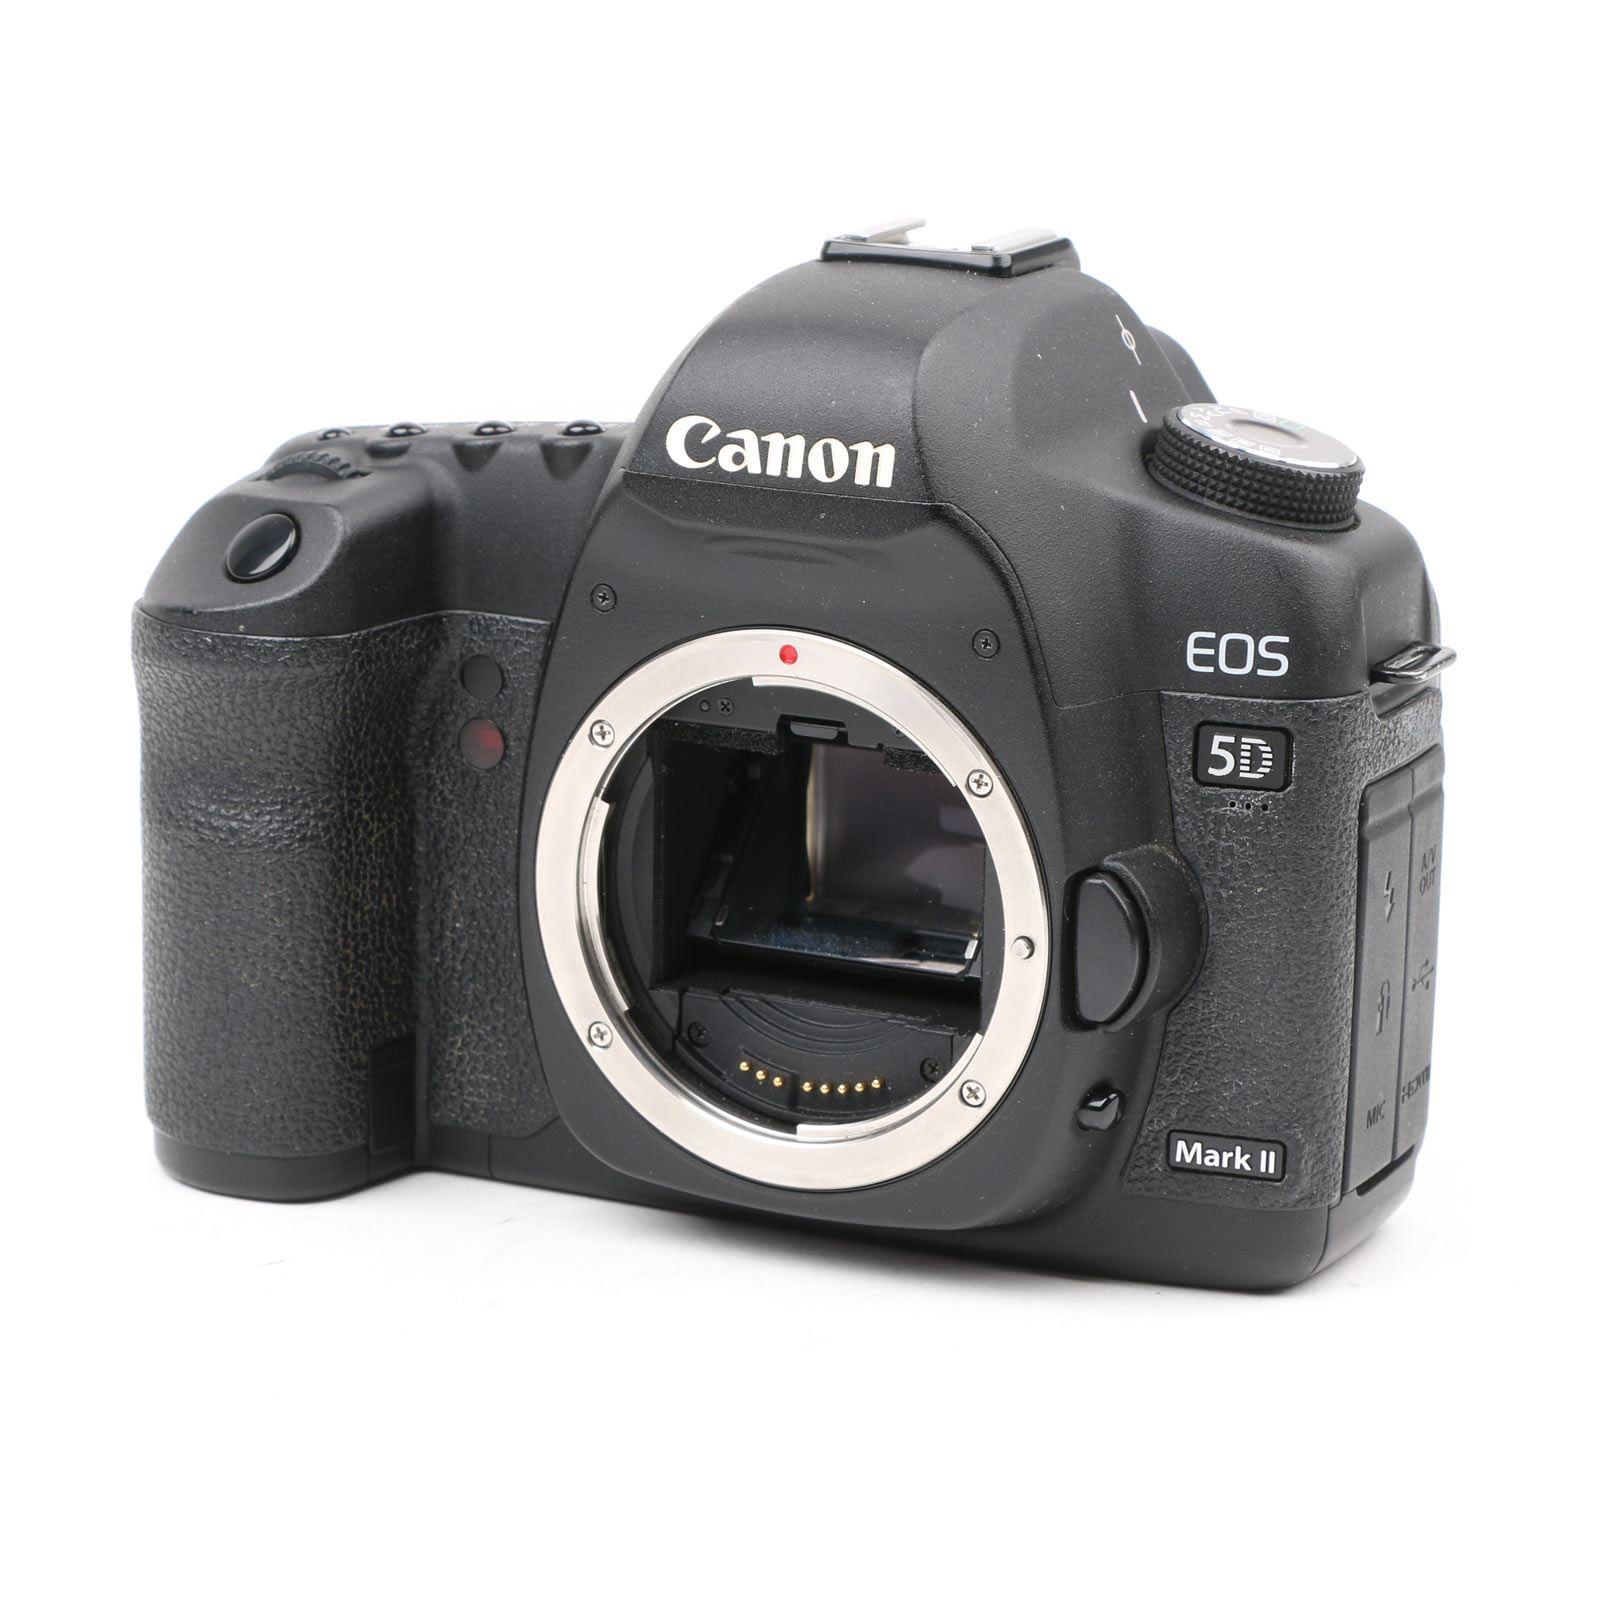 Image of Used Canon EOS 5D Mark II Digital SLR Camera Body